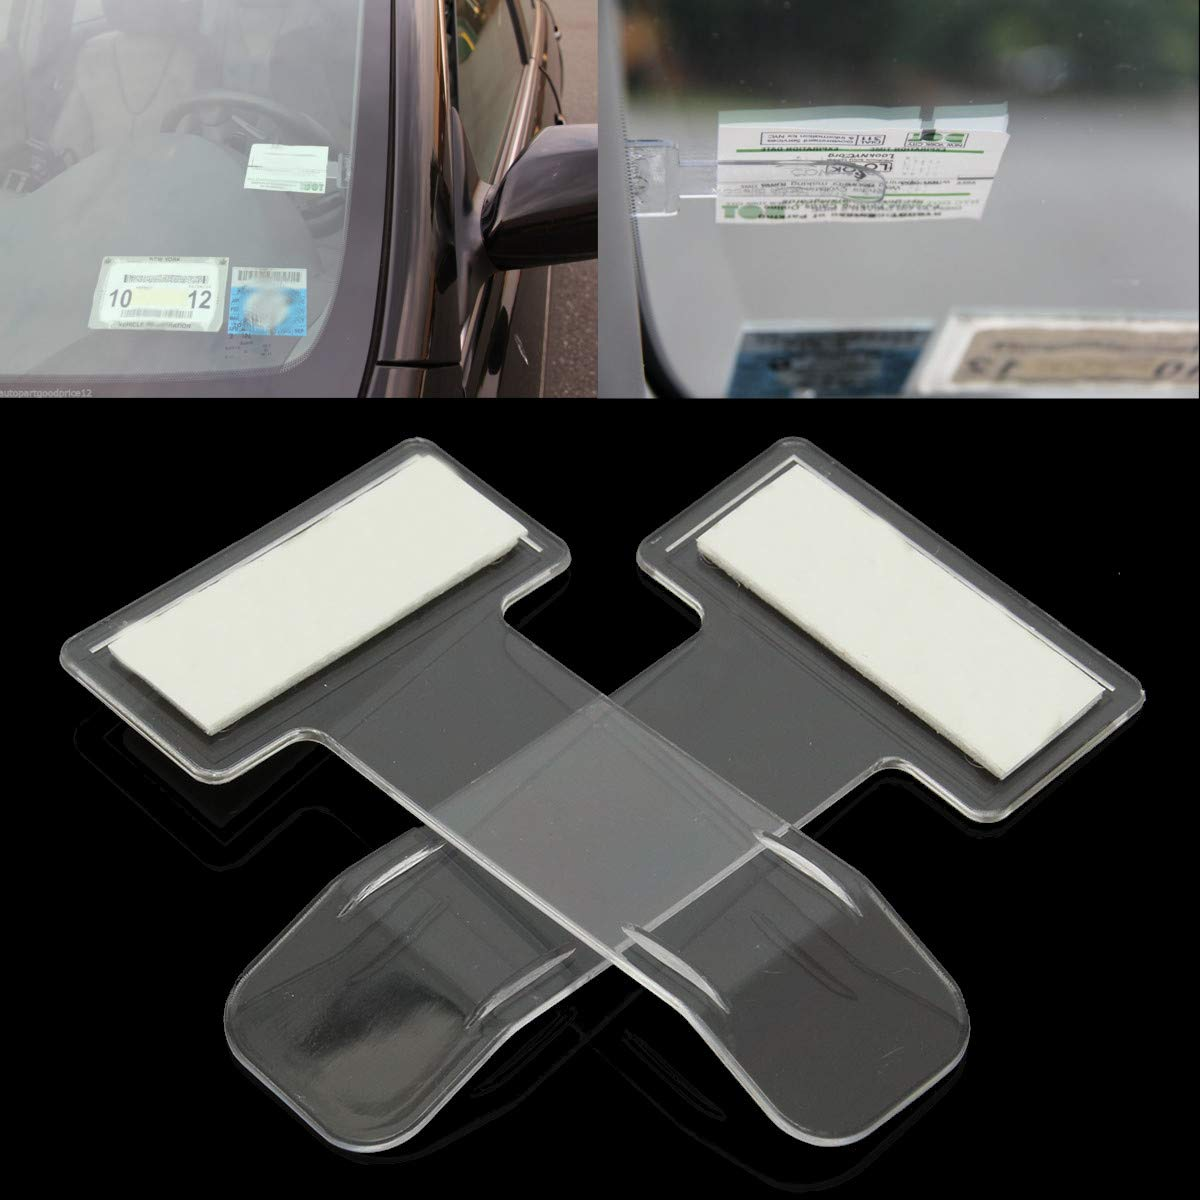 5x Car Vehicle Parking Ticket Permit Card Ticket Holder Clip Sticker Tools Set